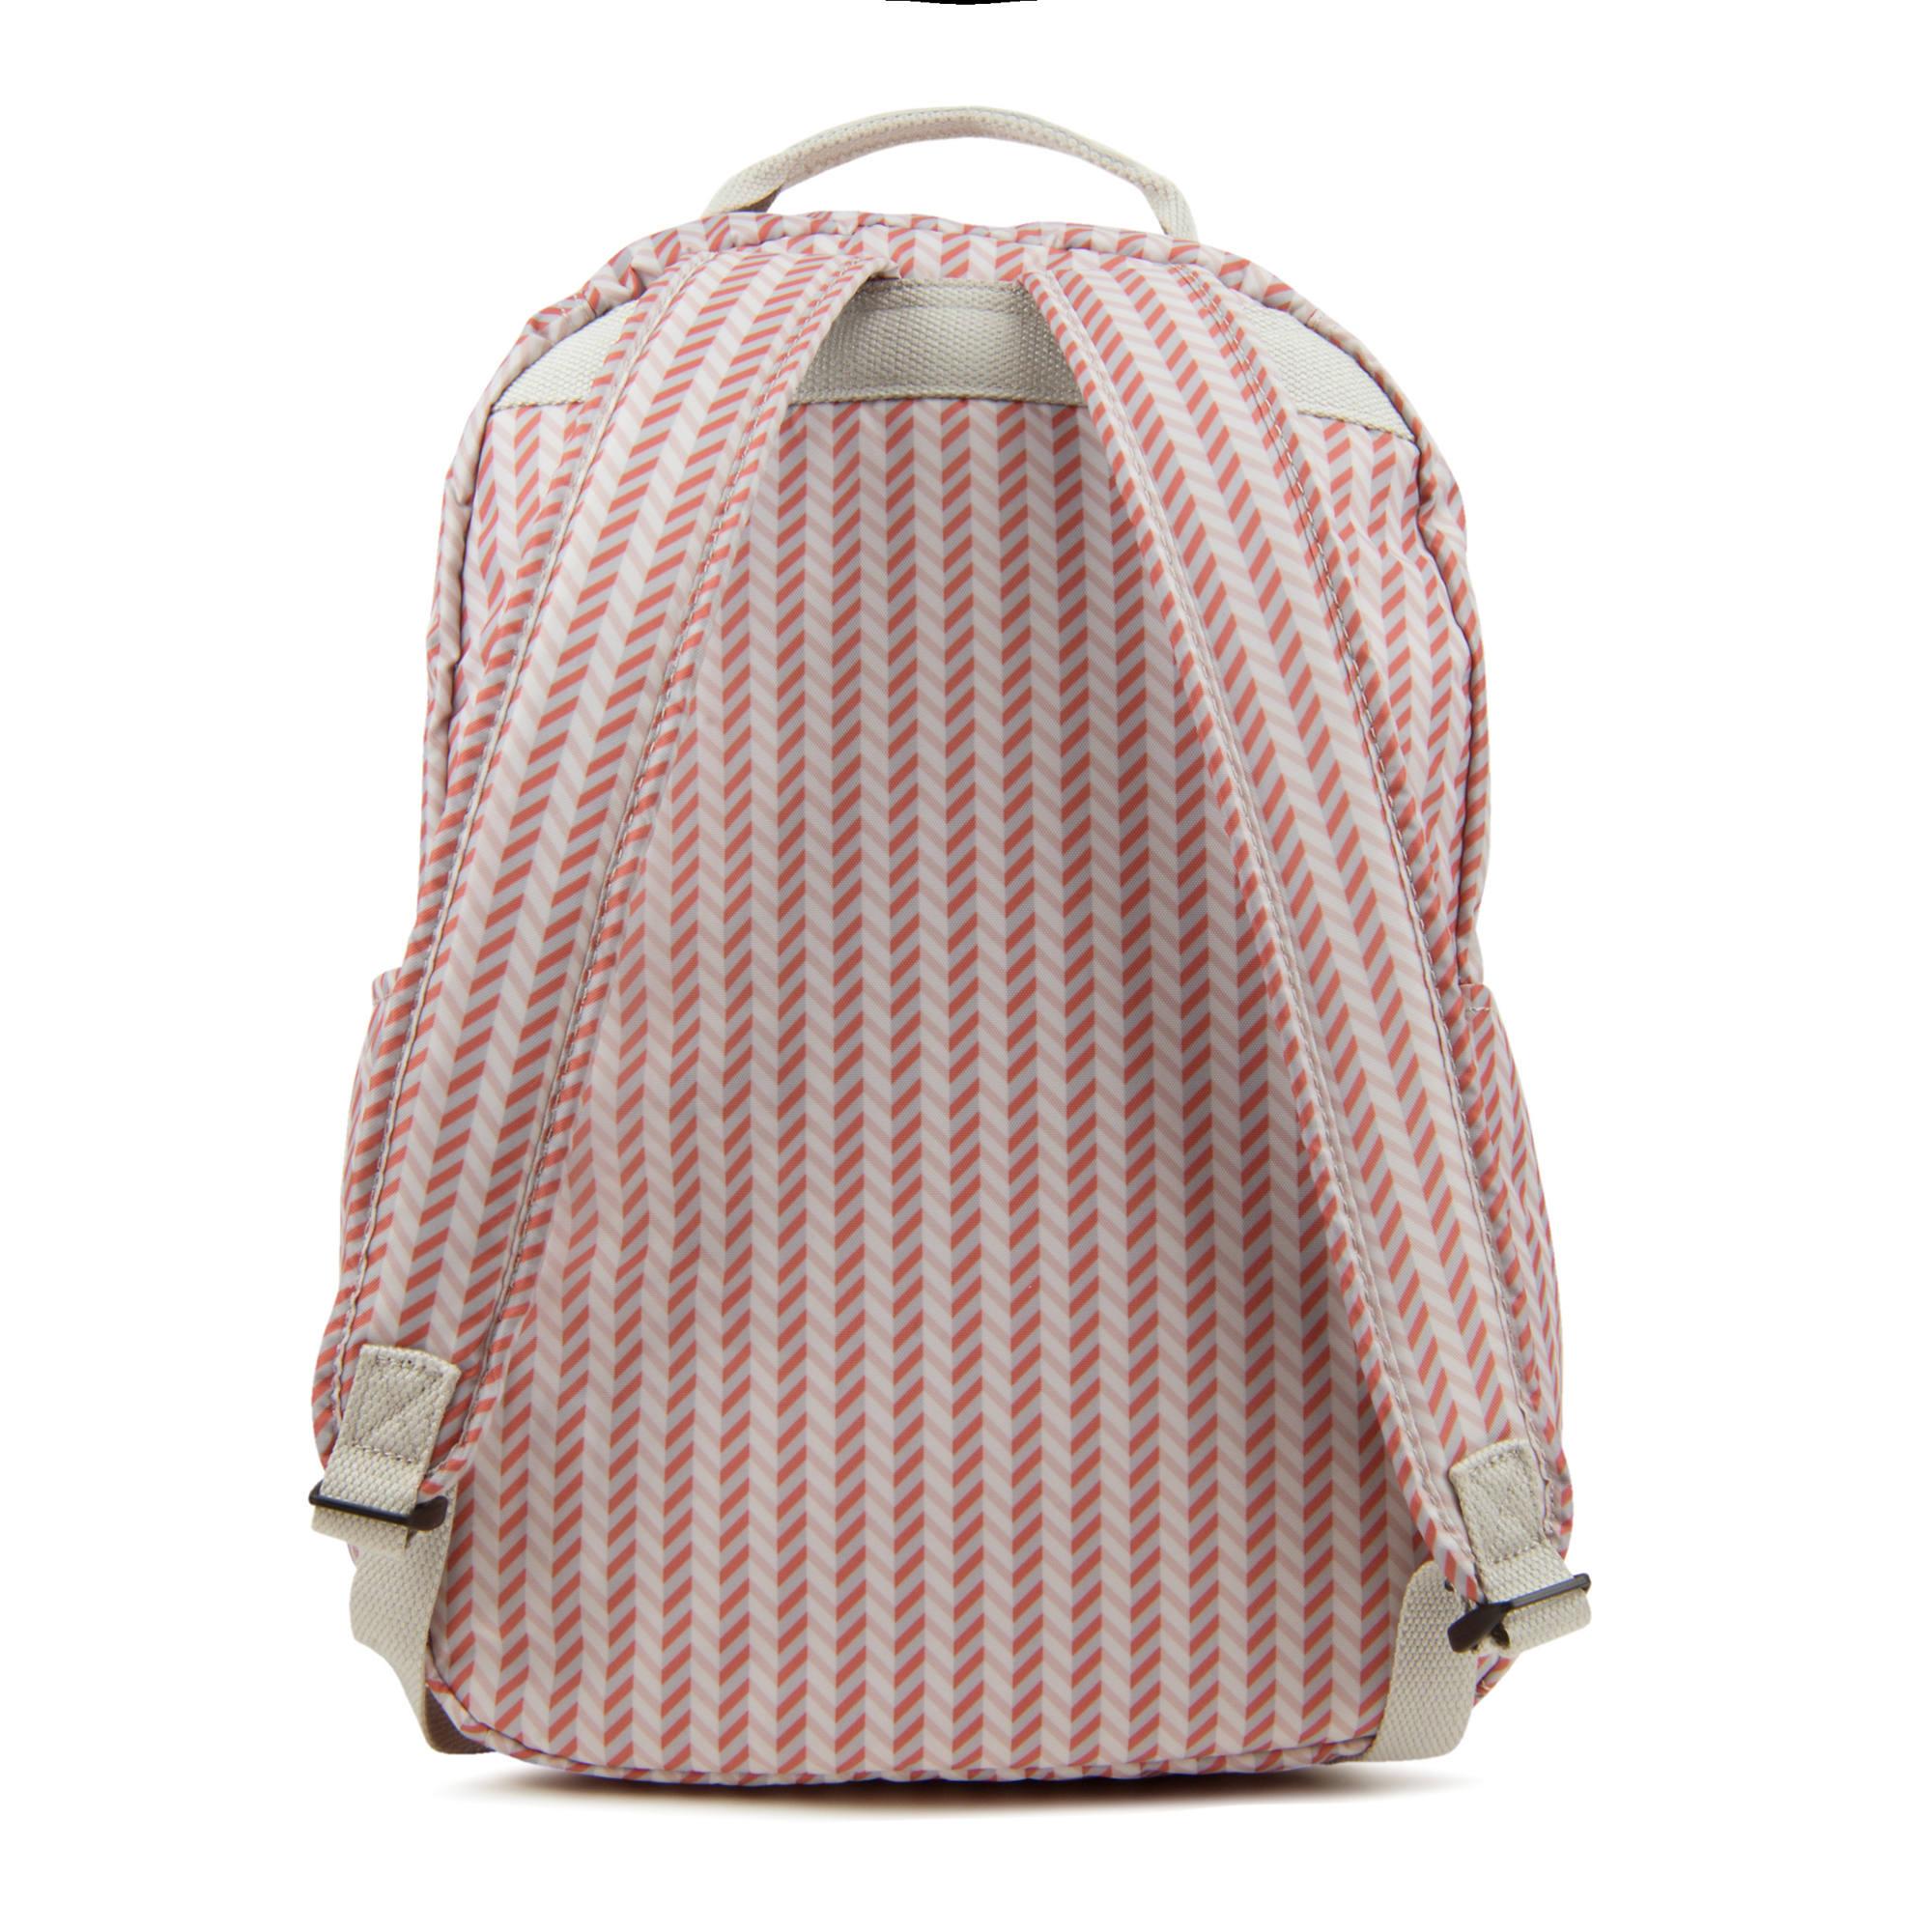 f2add4c3e99 Seoul Large Printed Laptop Backpack,Strawberry Pink Tonal Zipper,large